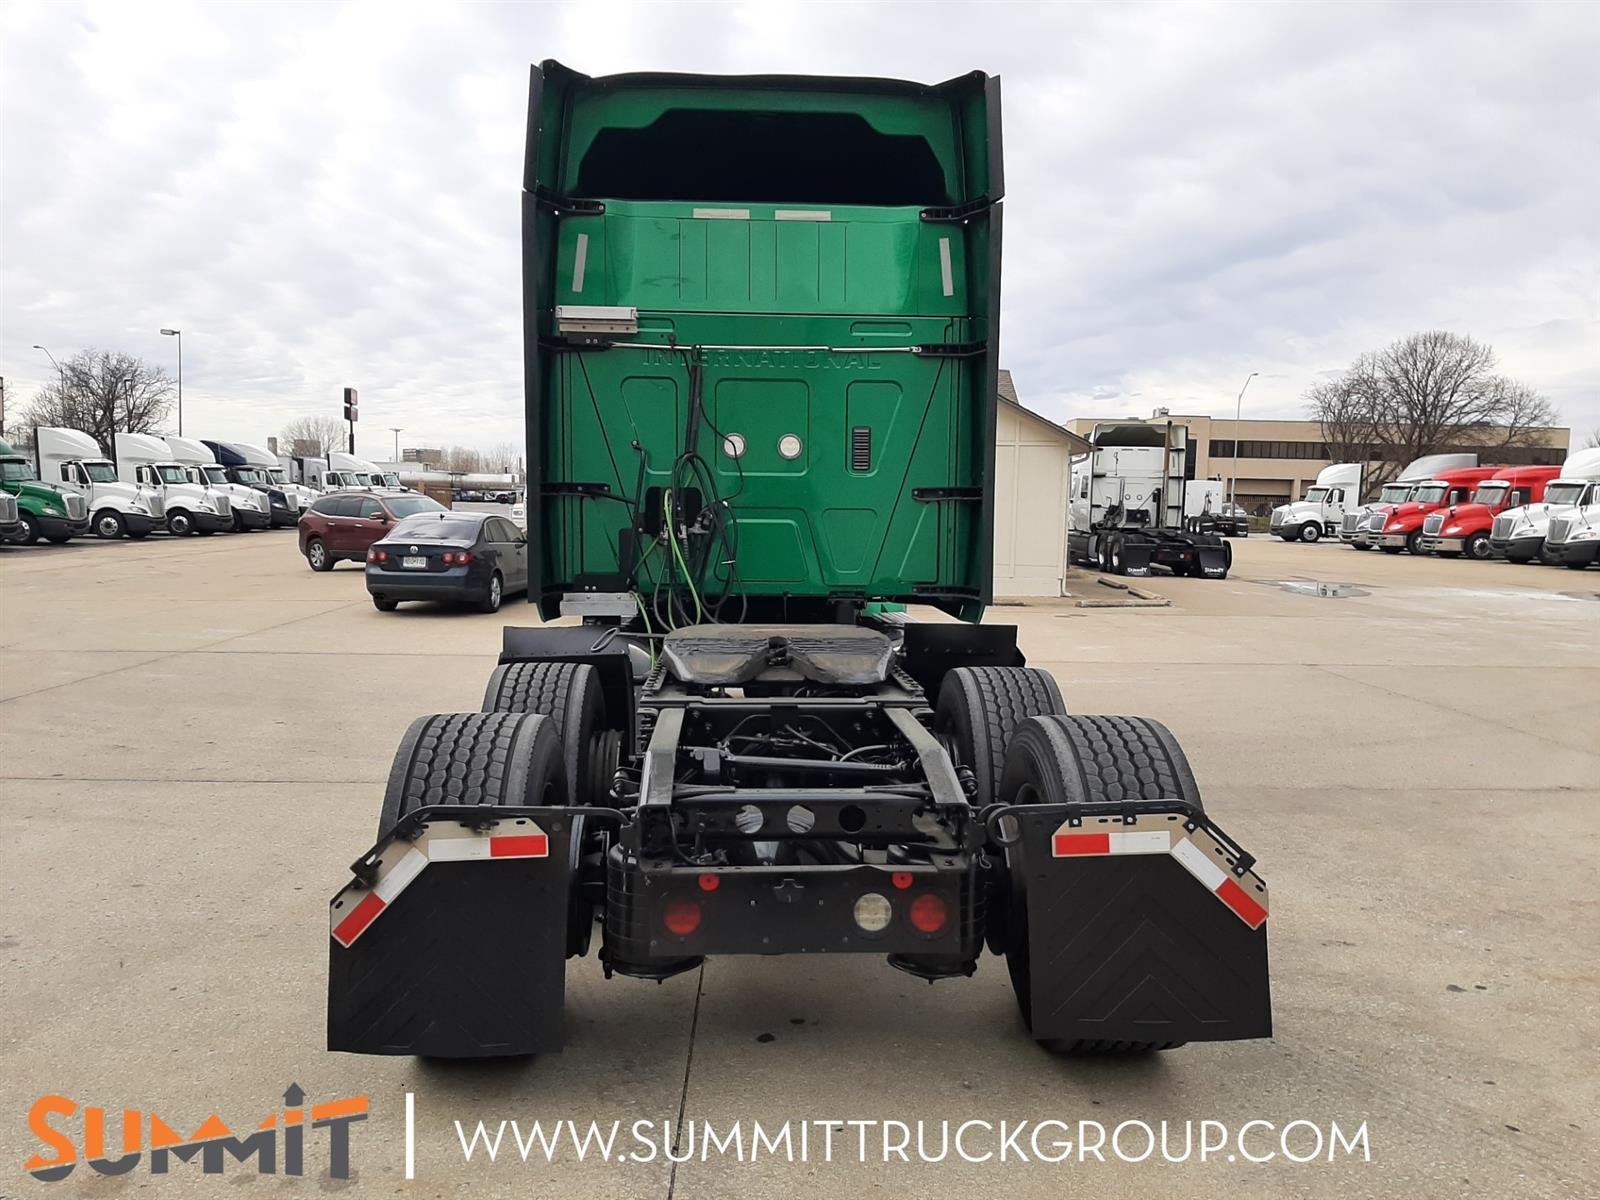 2017 International ProStar+ Sleeper Cab 6x4, Tractor #135N202152 - photo 1